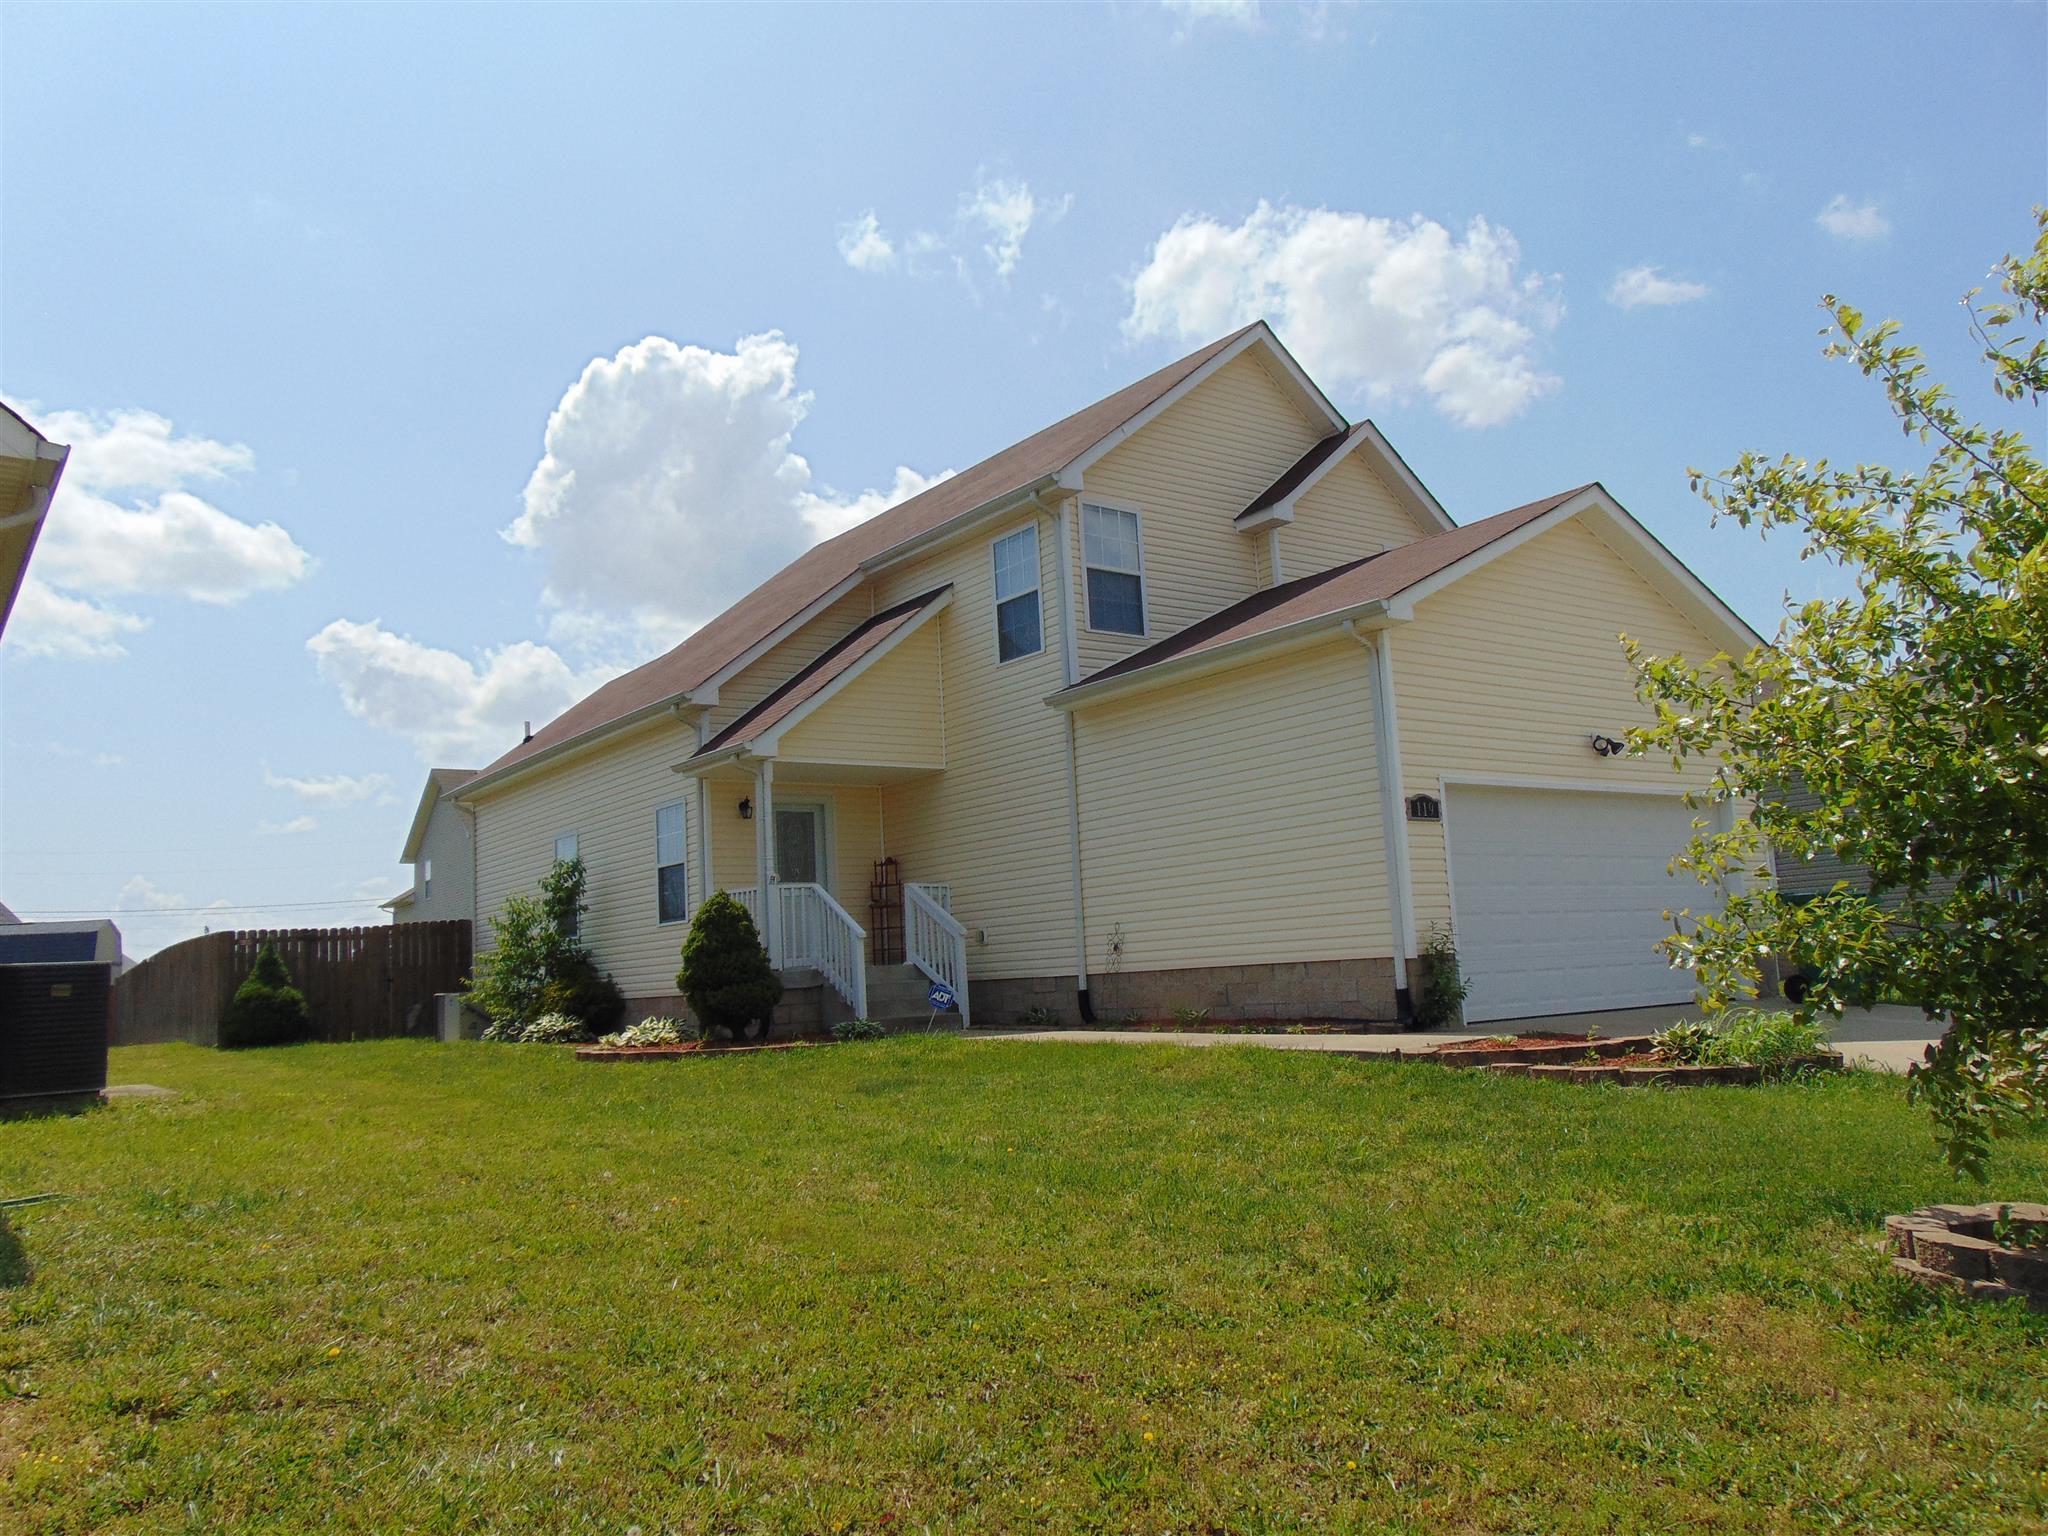 119 N Cavalcade Cir, Oak Grove, KY 42262